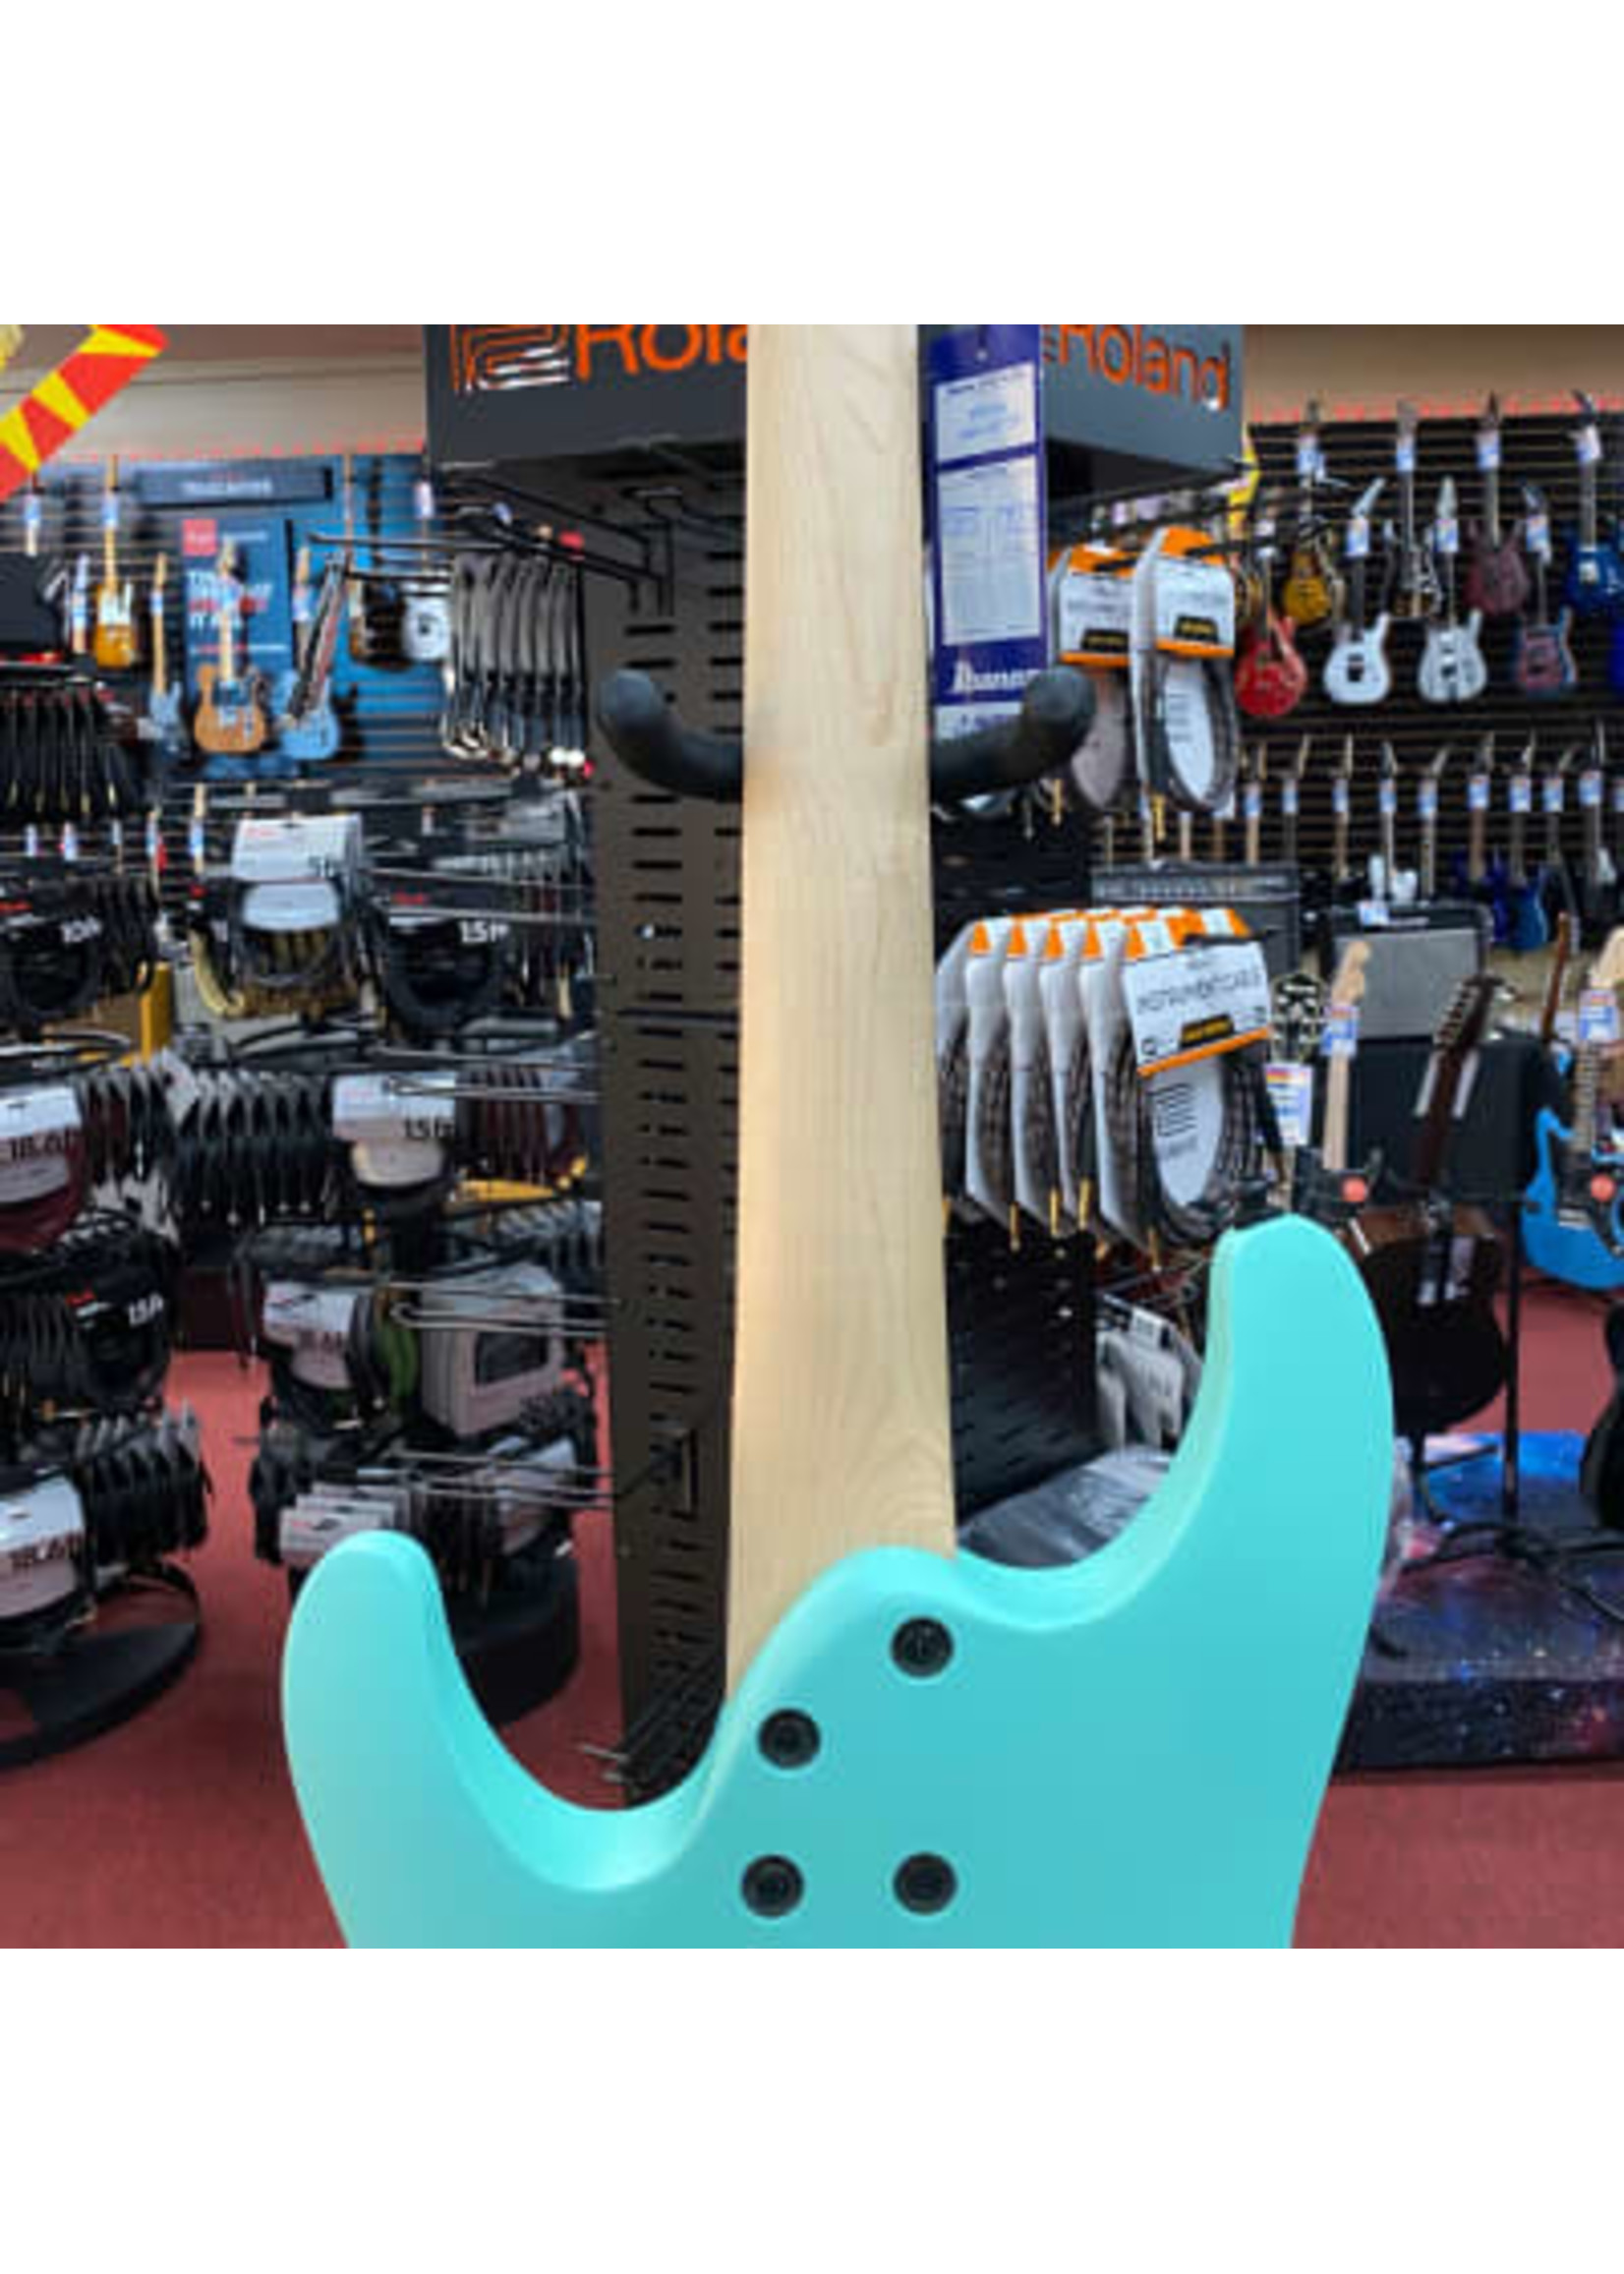 Ibanez Ibanez Standard S561 Electric Guitar - Sea Foam Green Matte